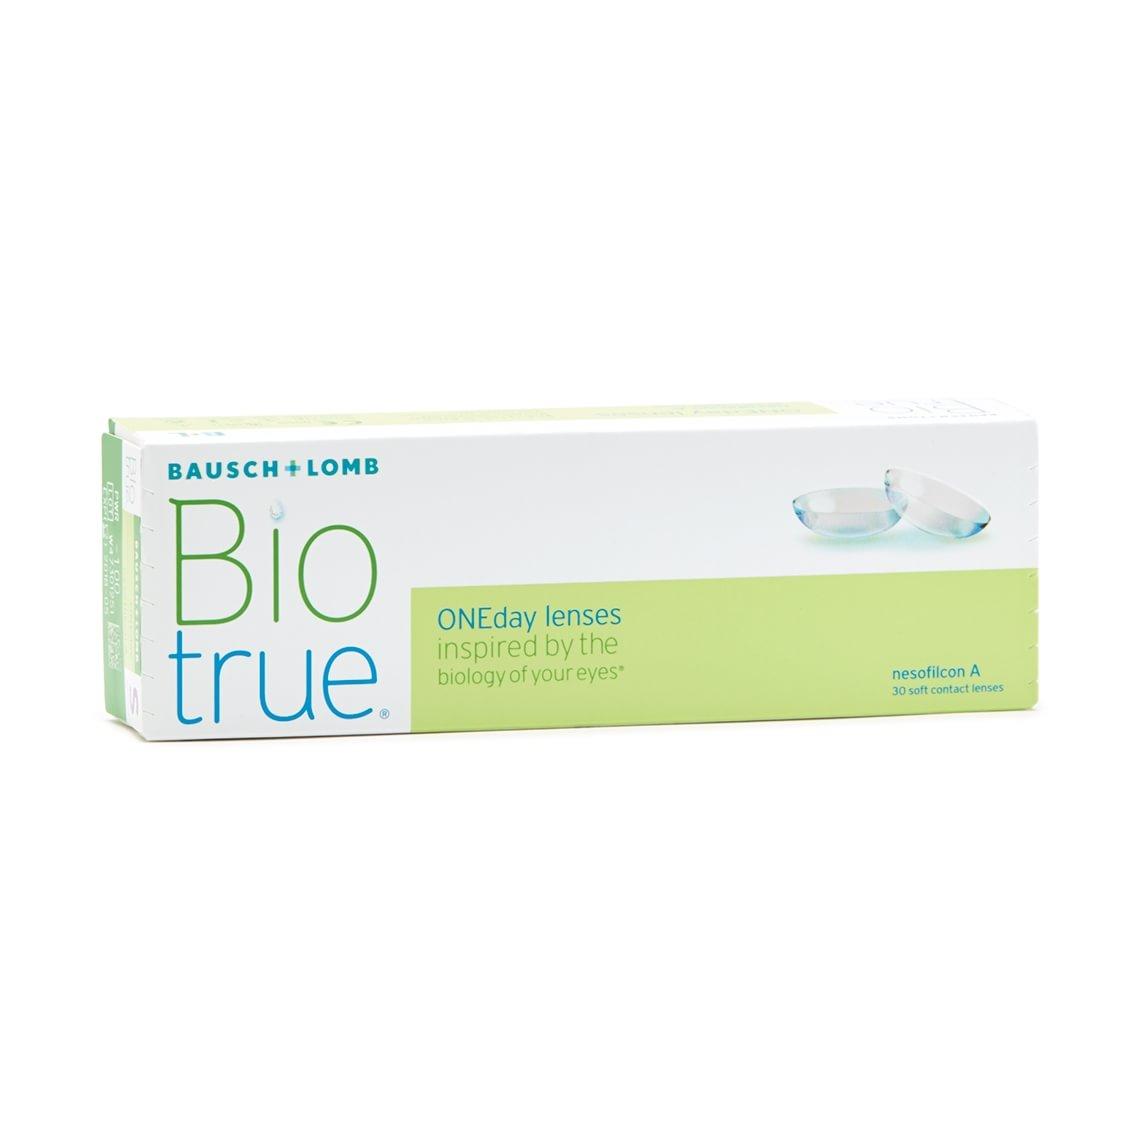 BioTrue ONEday 30 st/box